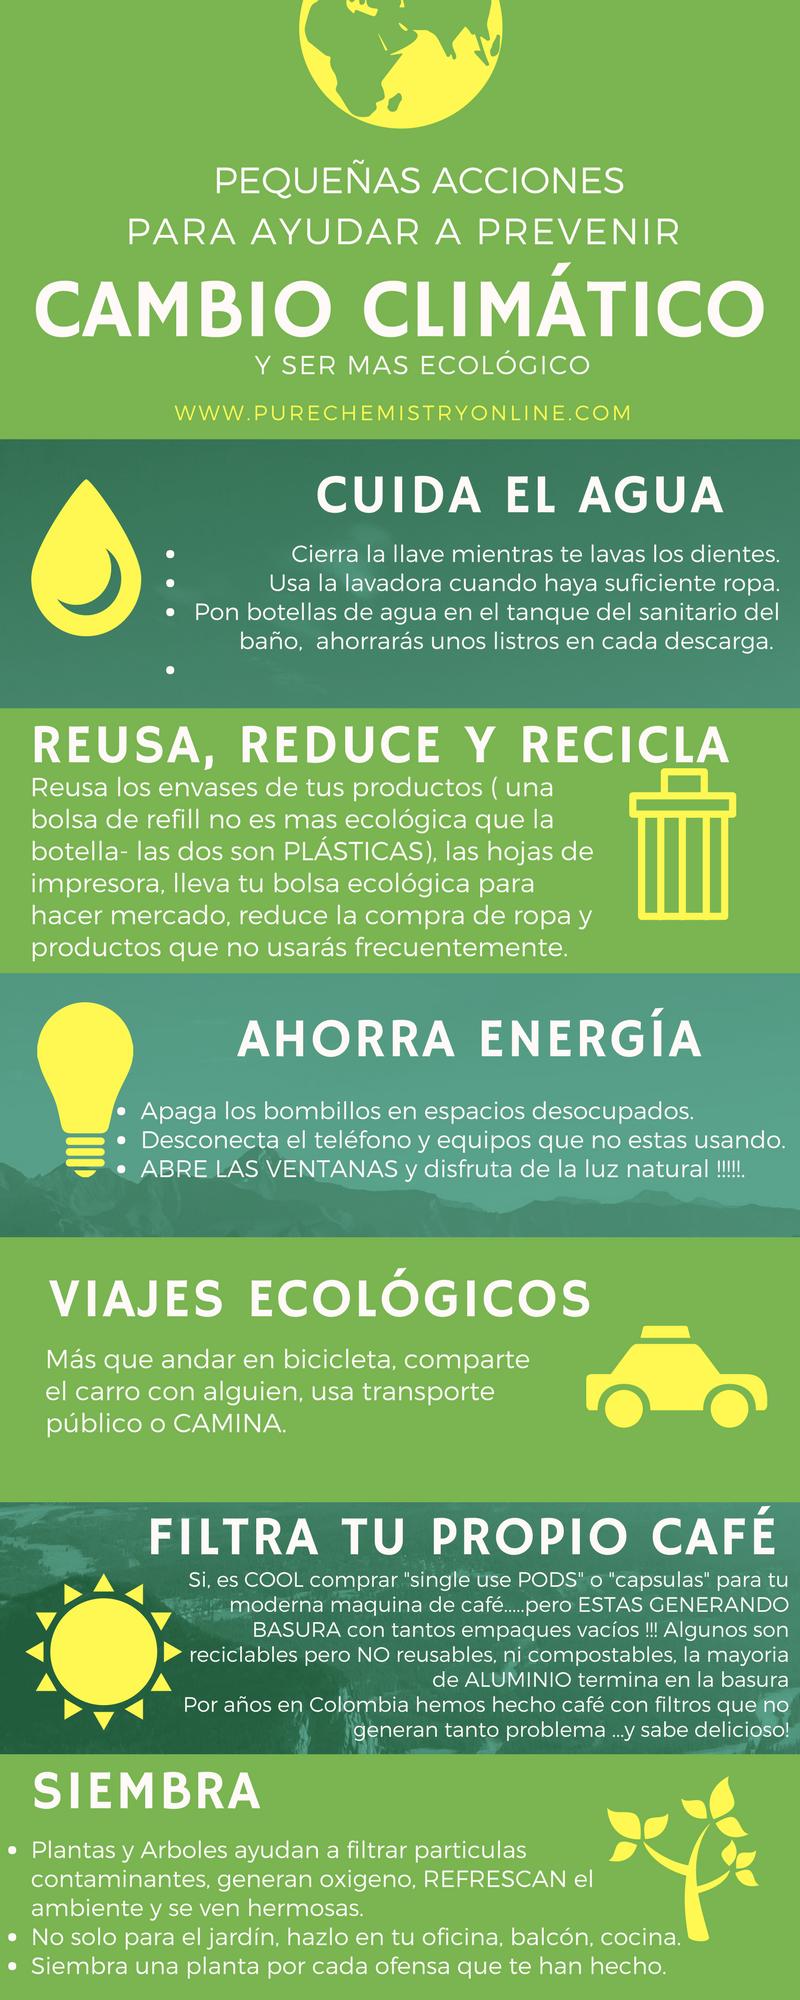 Cambio climatico acciones ecologicas pure chemistry.png